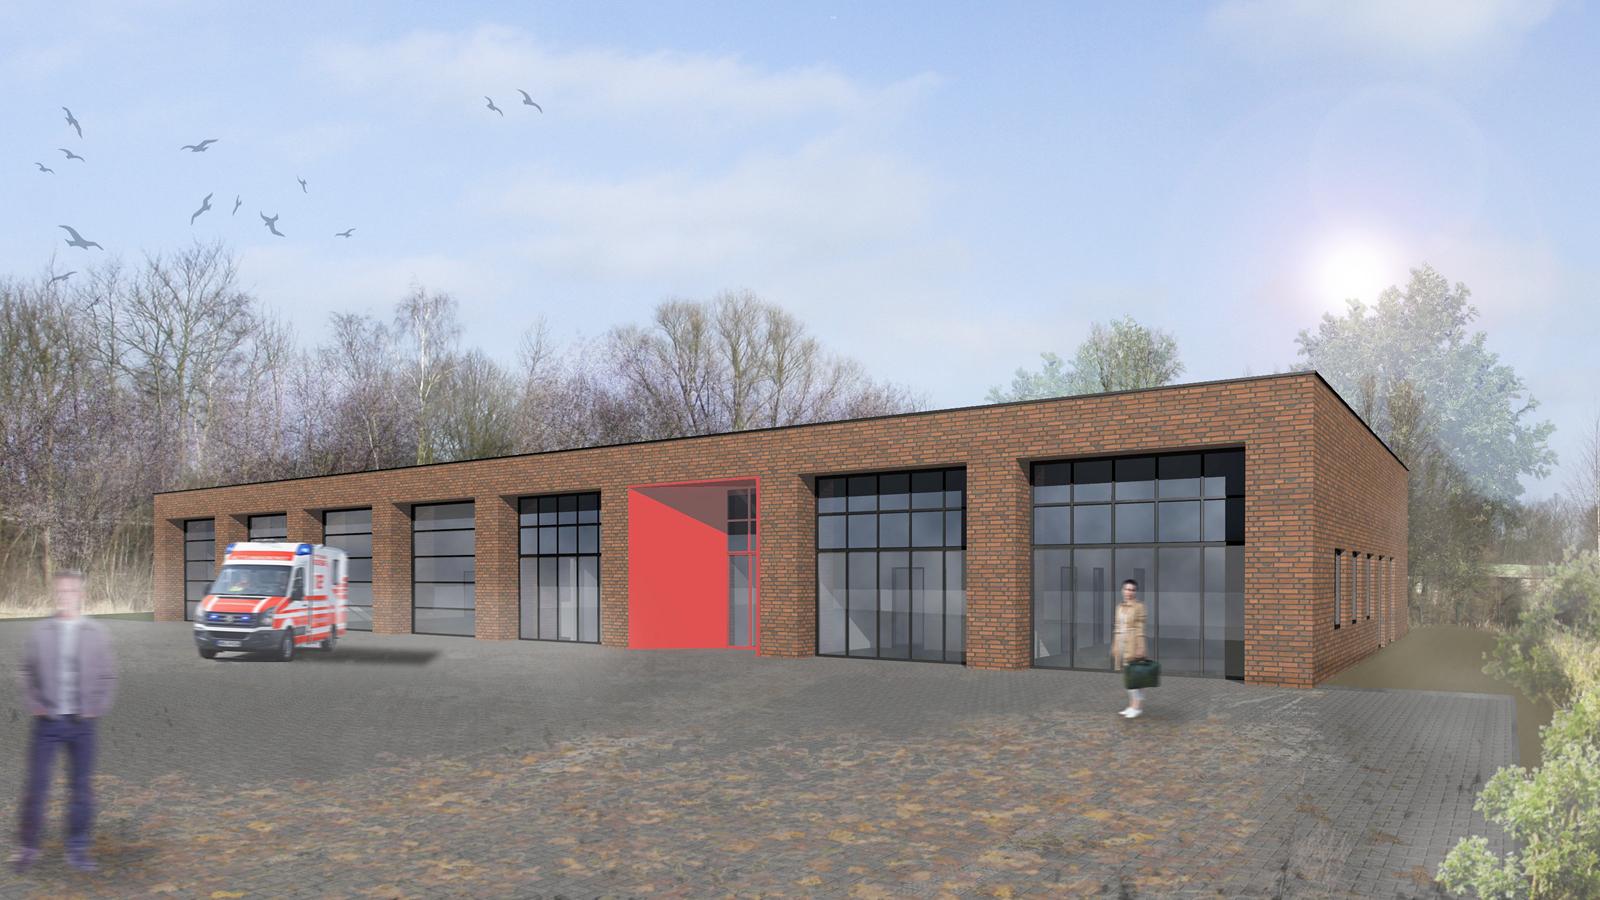 Neubau Rettungswache, Koenigs Rütter Architekten